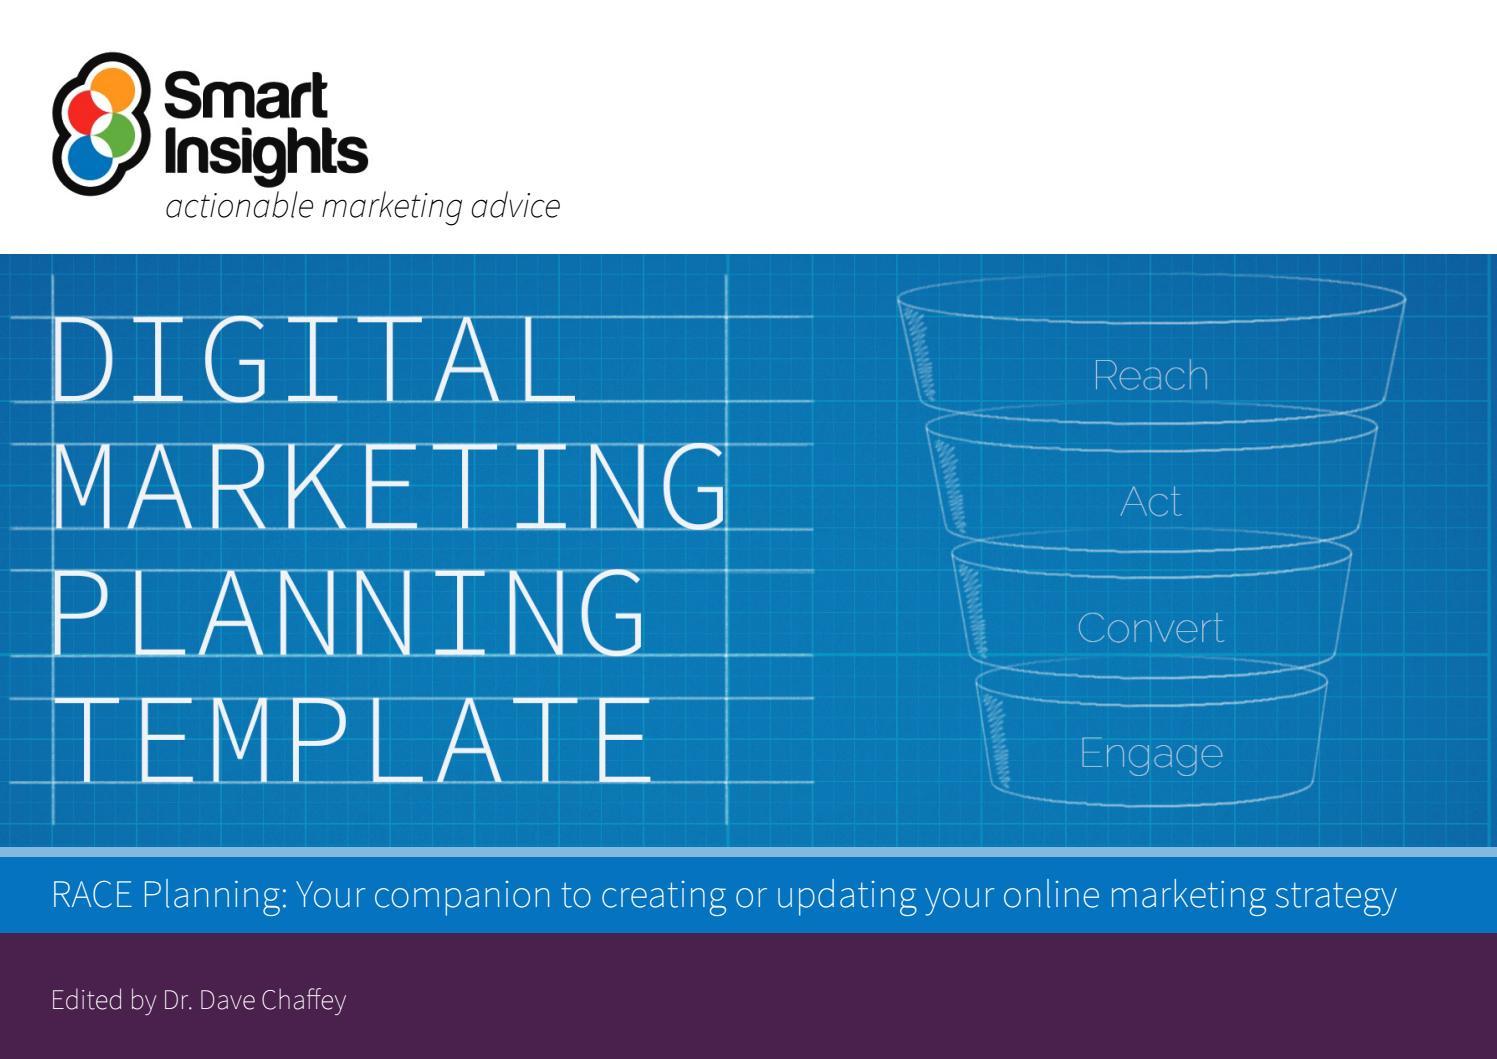 Digital Marketing Plan Template Smart Insights By Dani Hasan Issuu - How to create a marketing plan template